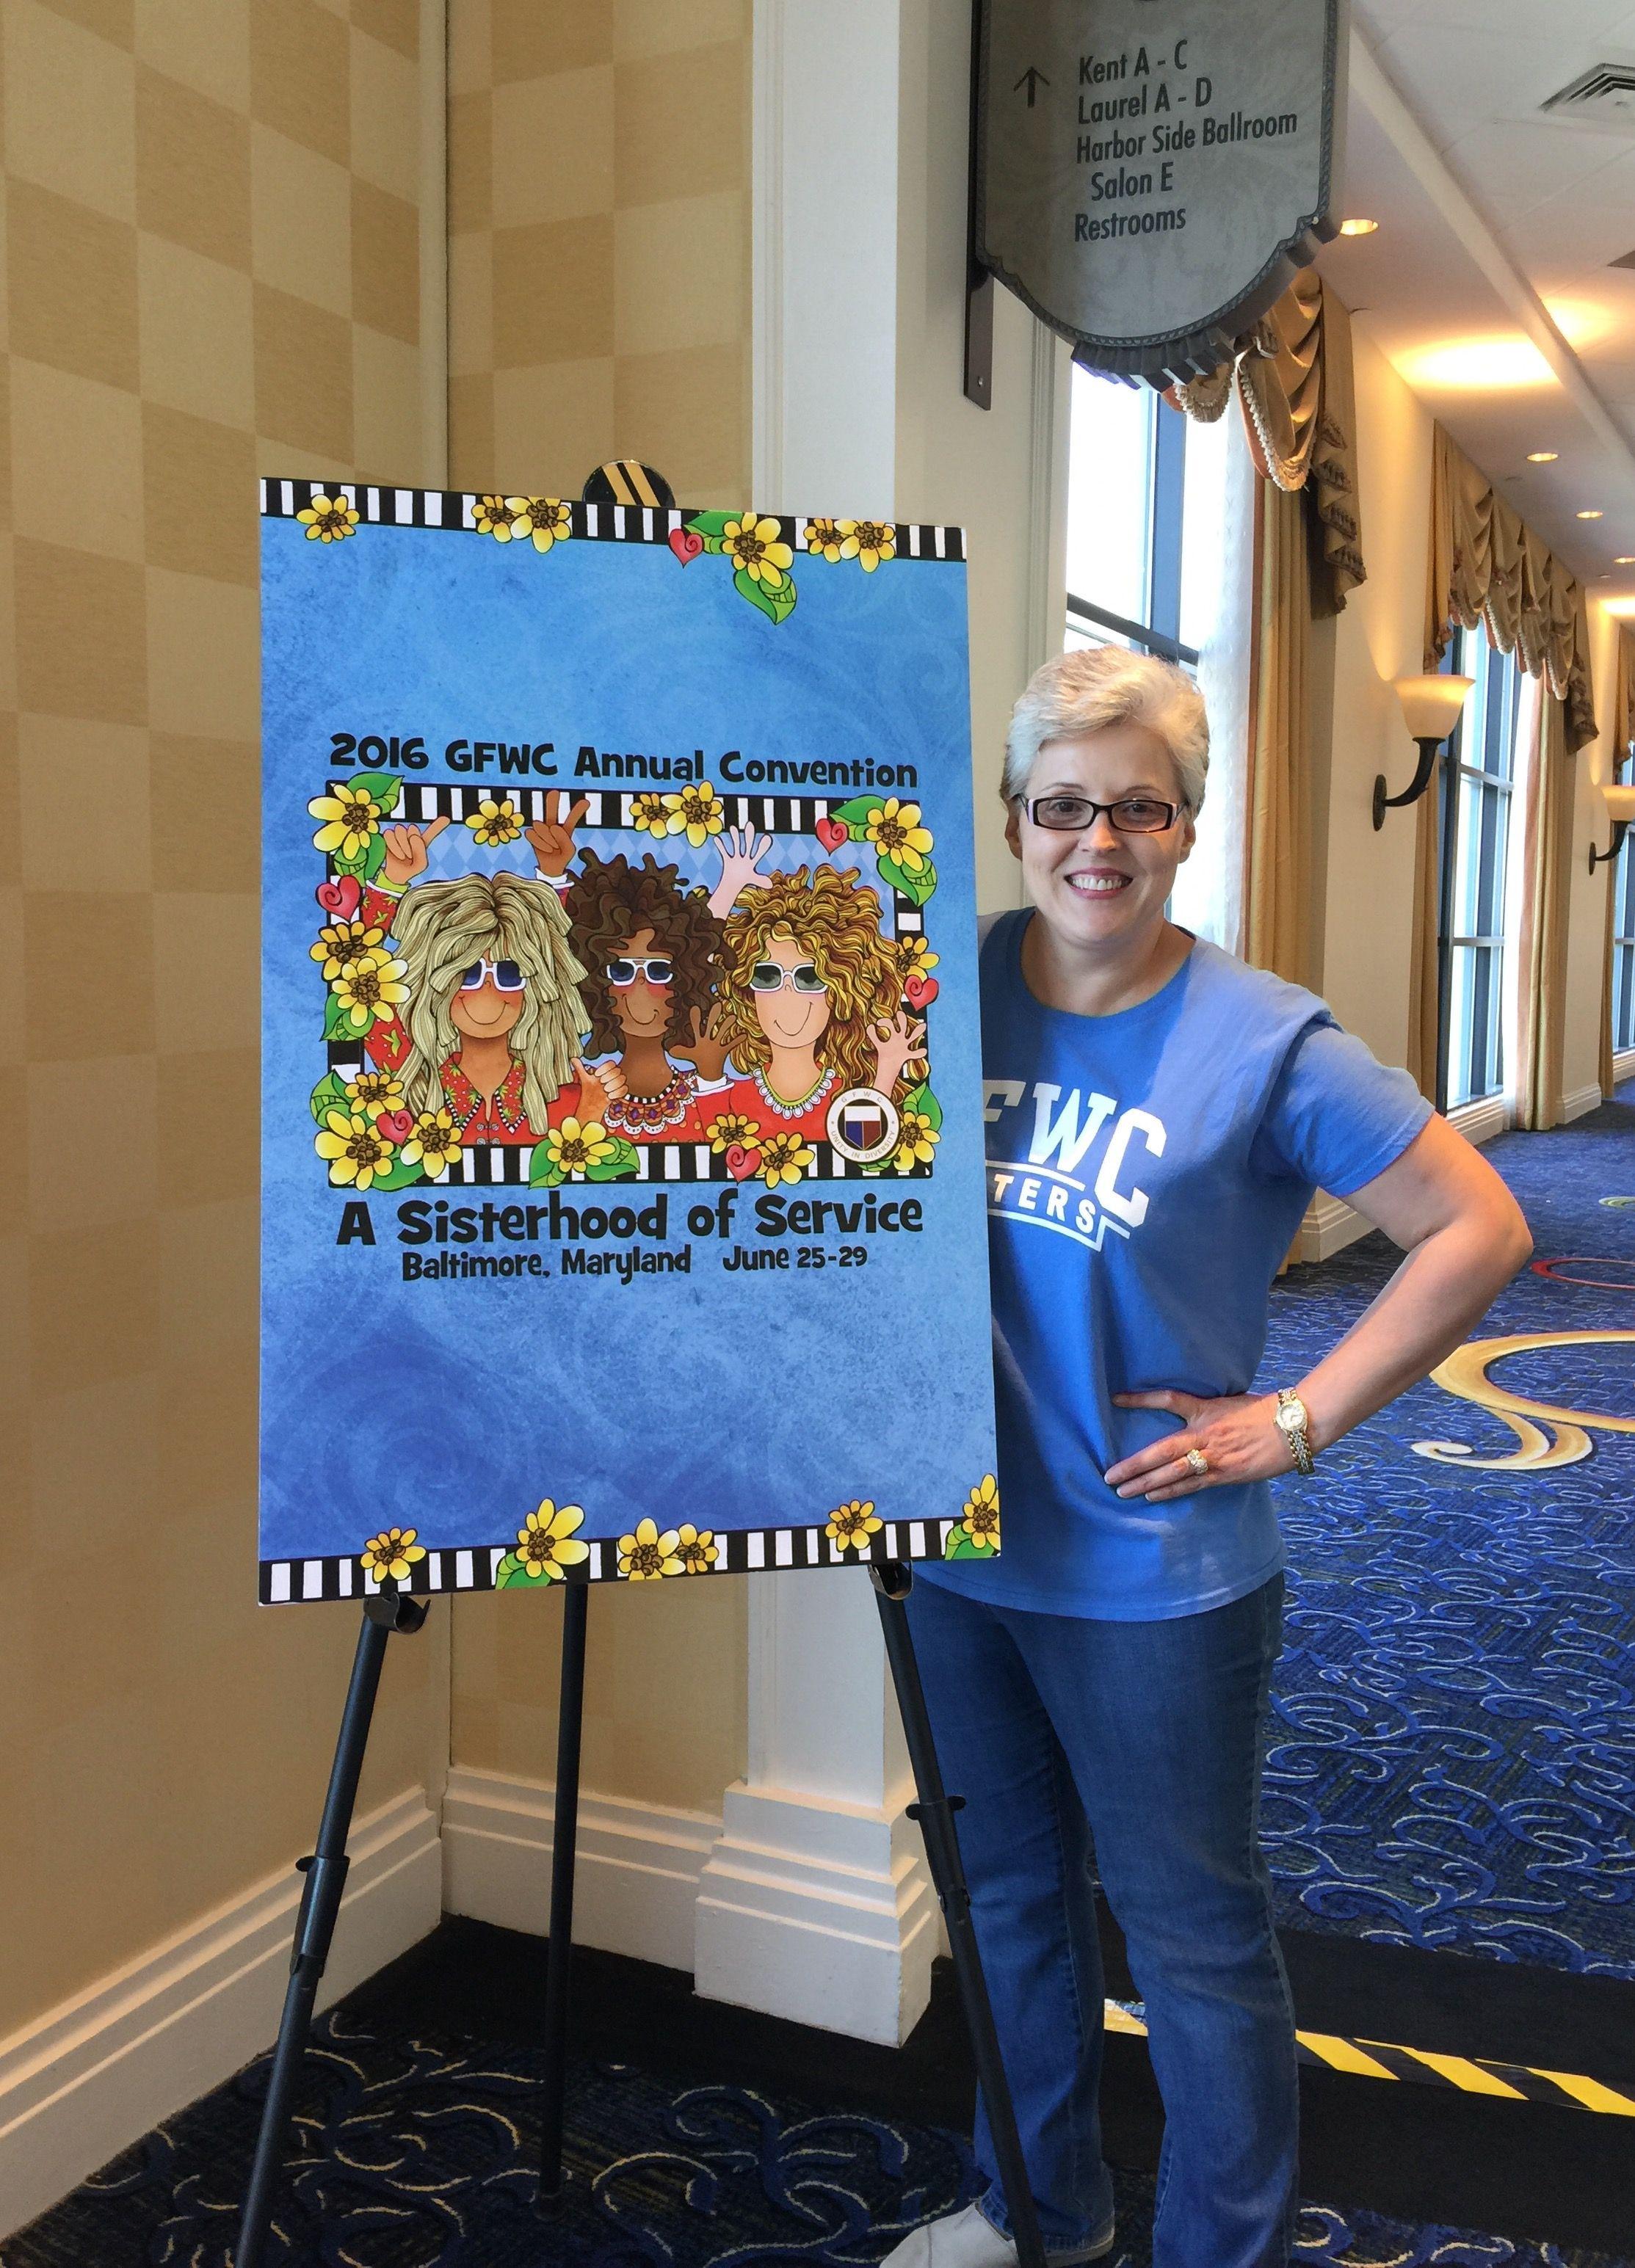 Helen Lamberth Sisterhood of Service GFWC Convention, Baltimore Maryland 2016